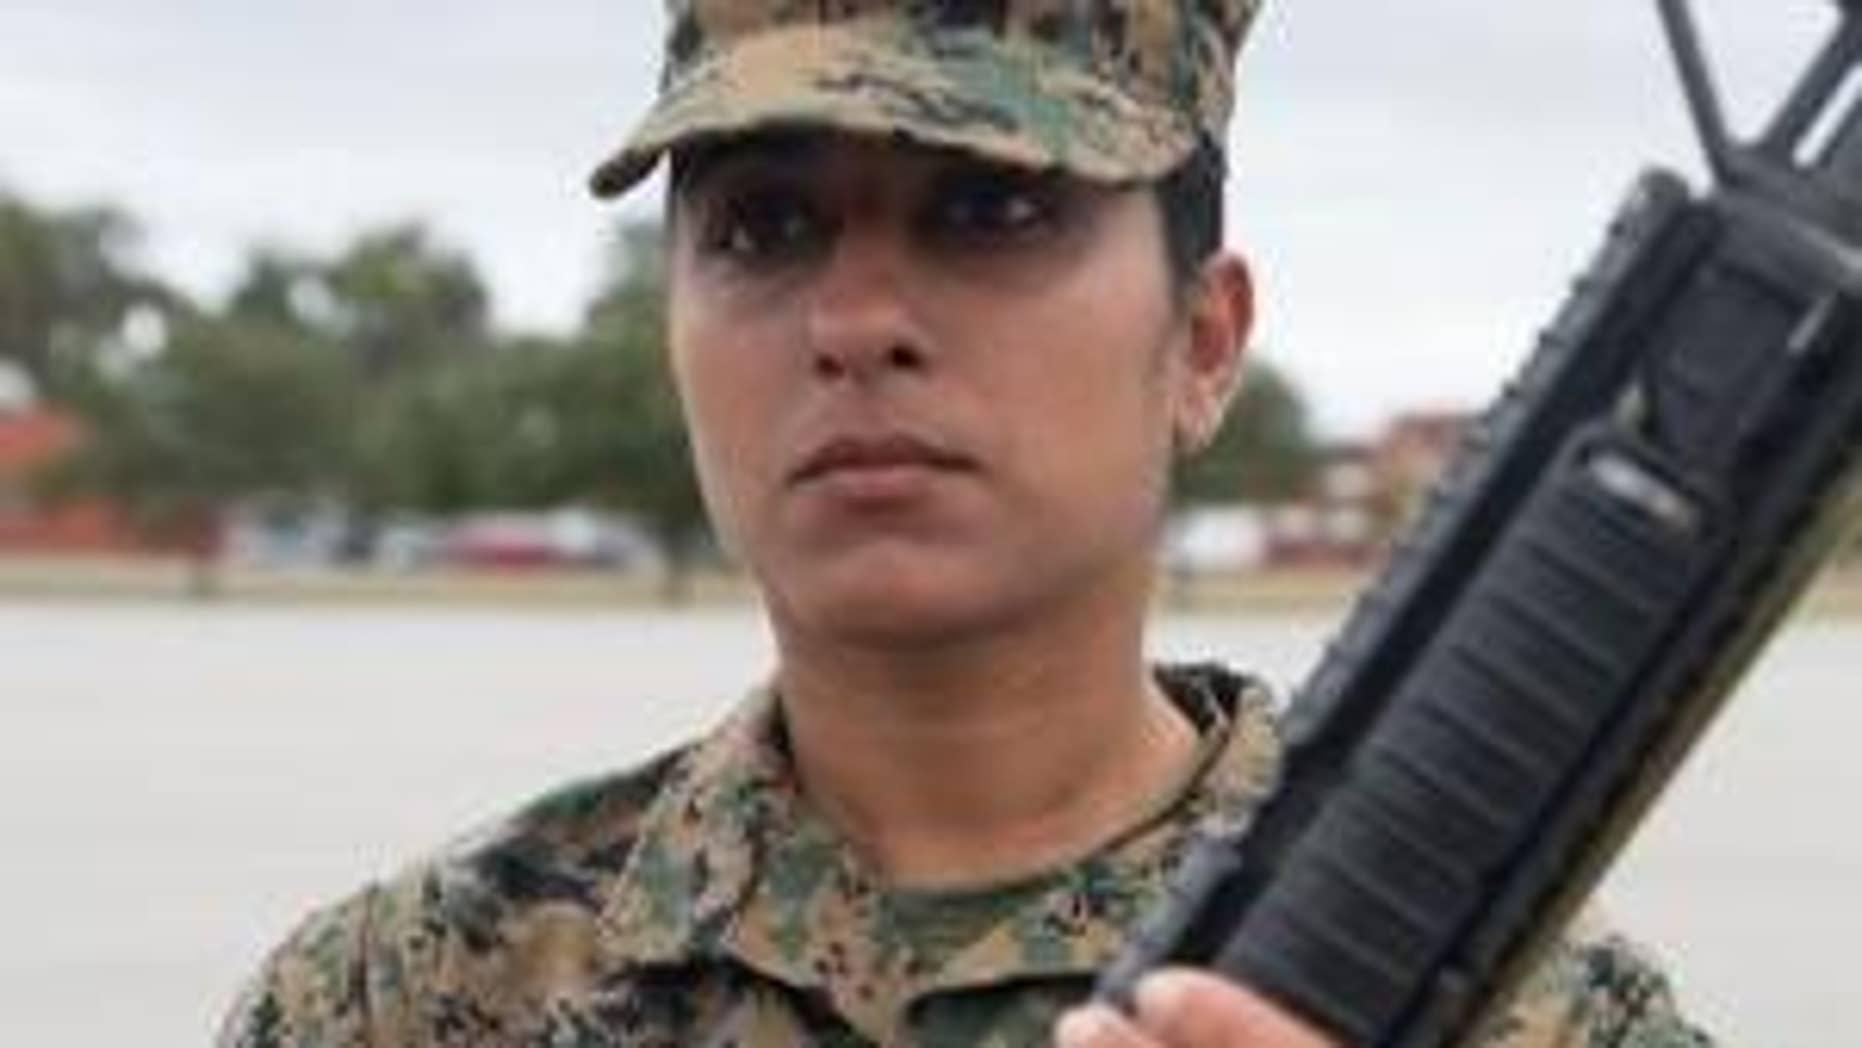 Seems Sexy army girl in iraq